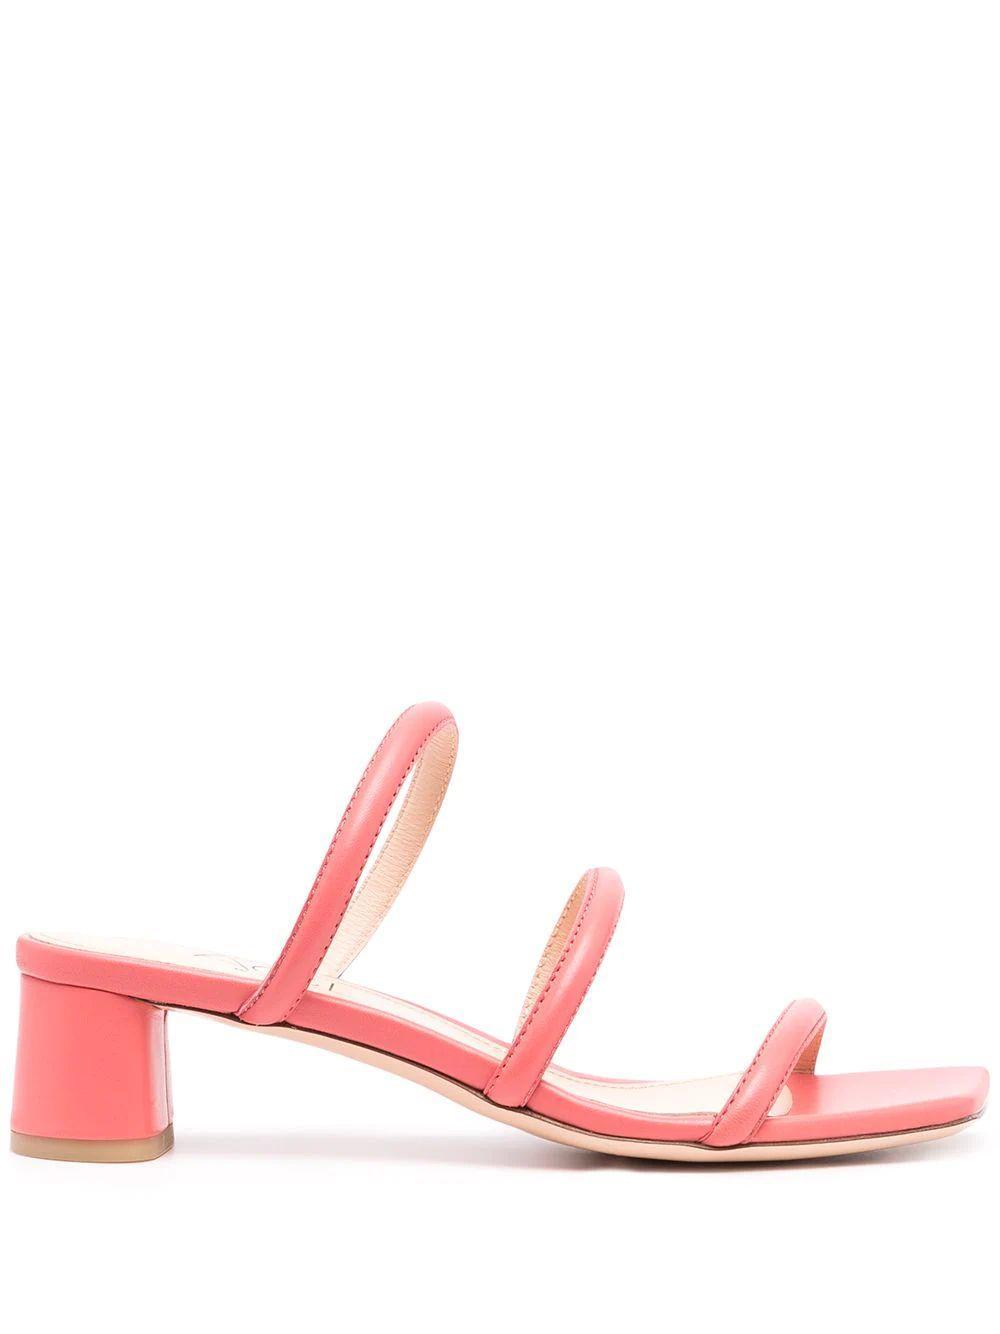 Silvia Strappy Block Heel Sandal